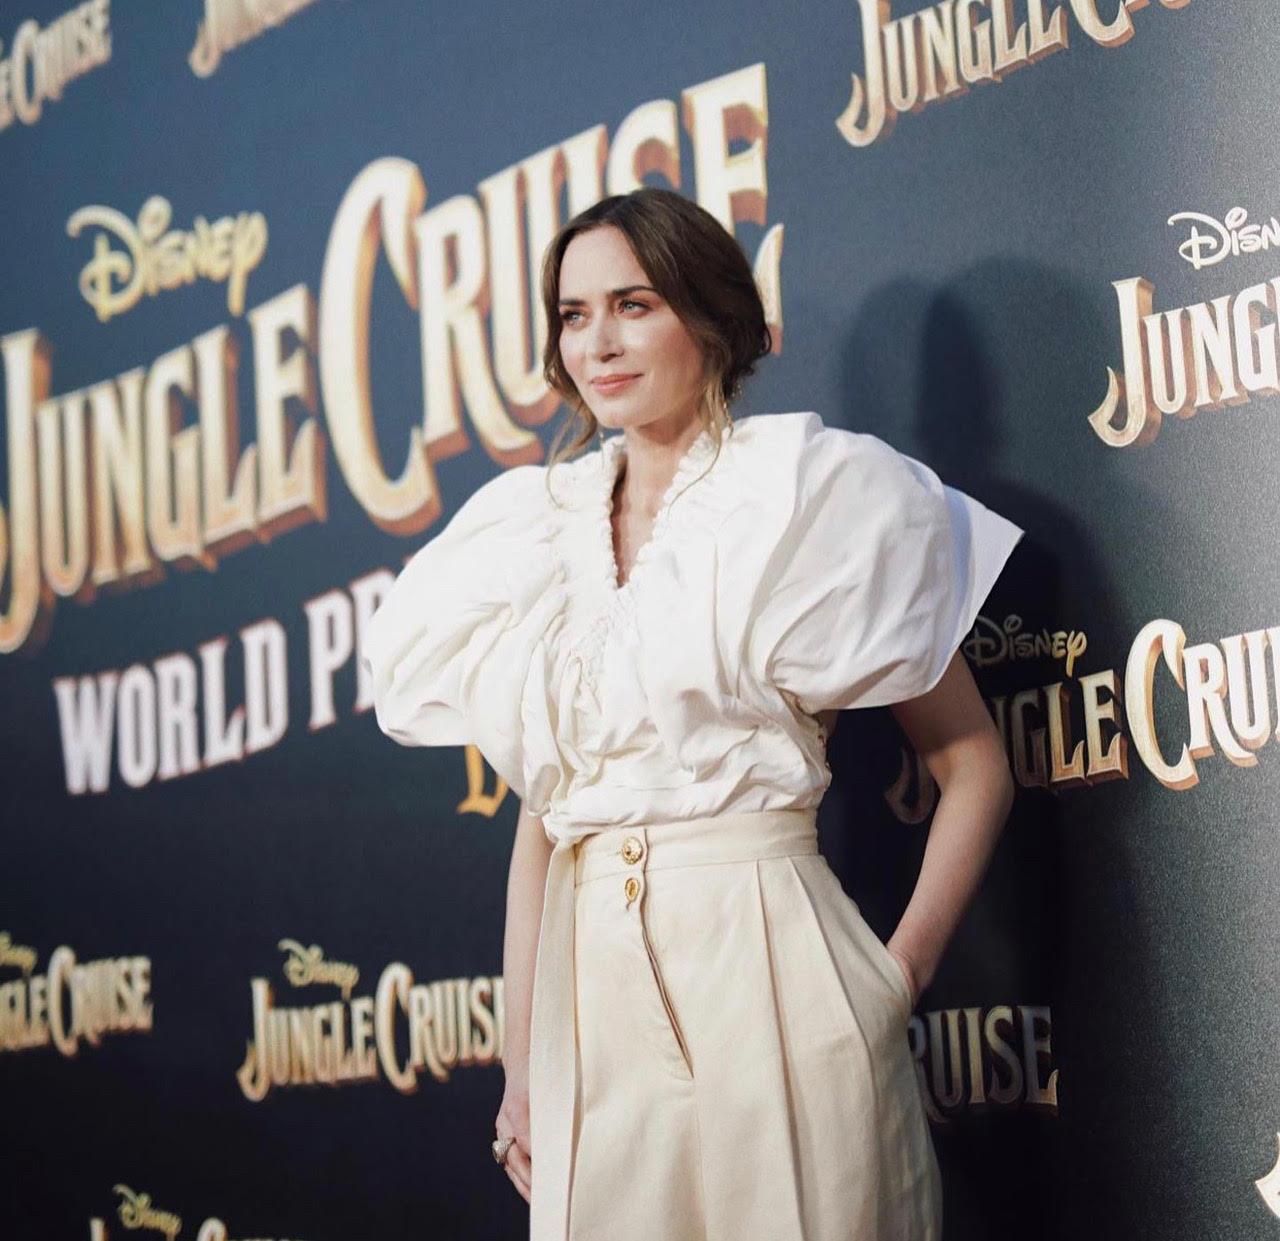 Emily Blunt x Jungle Cruise World Premier